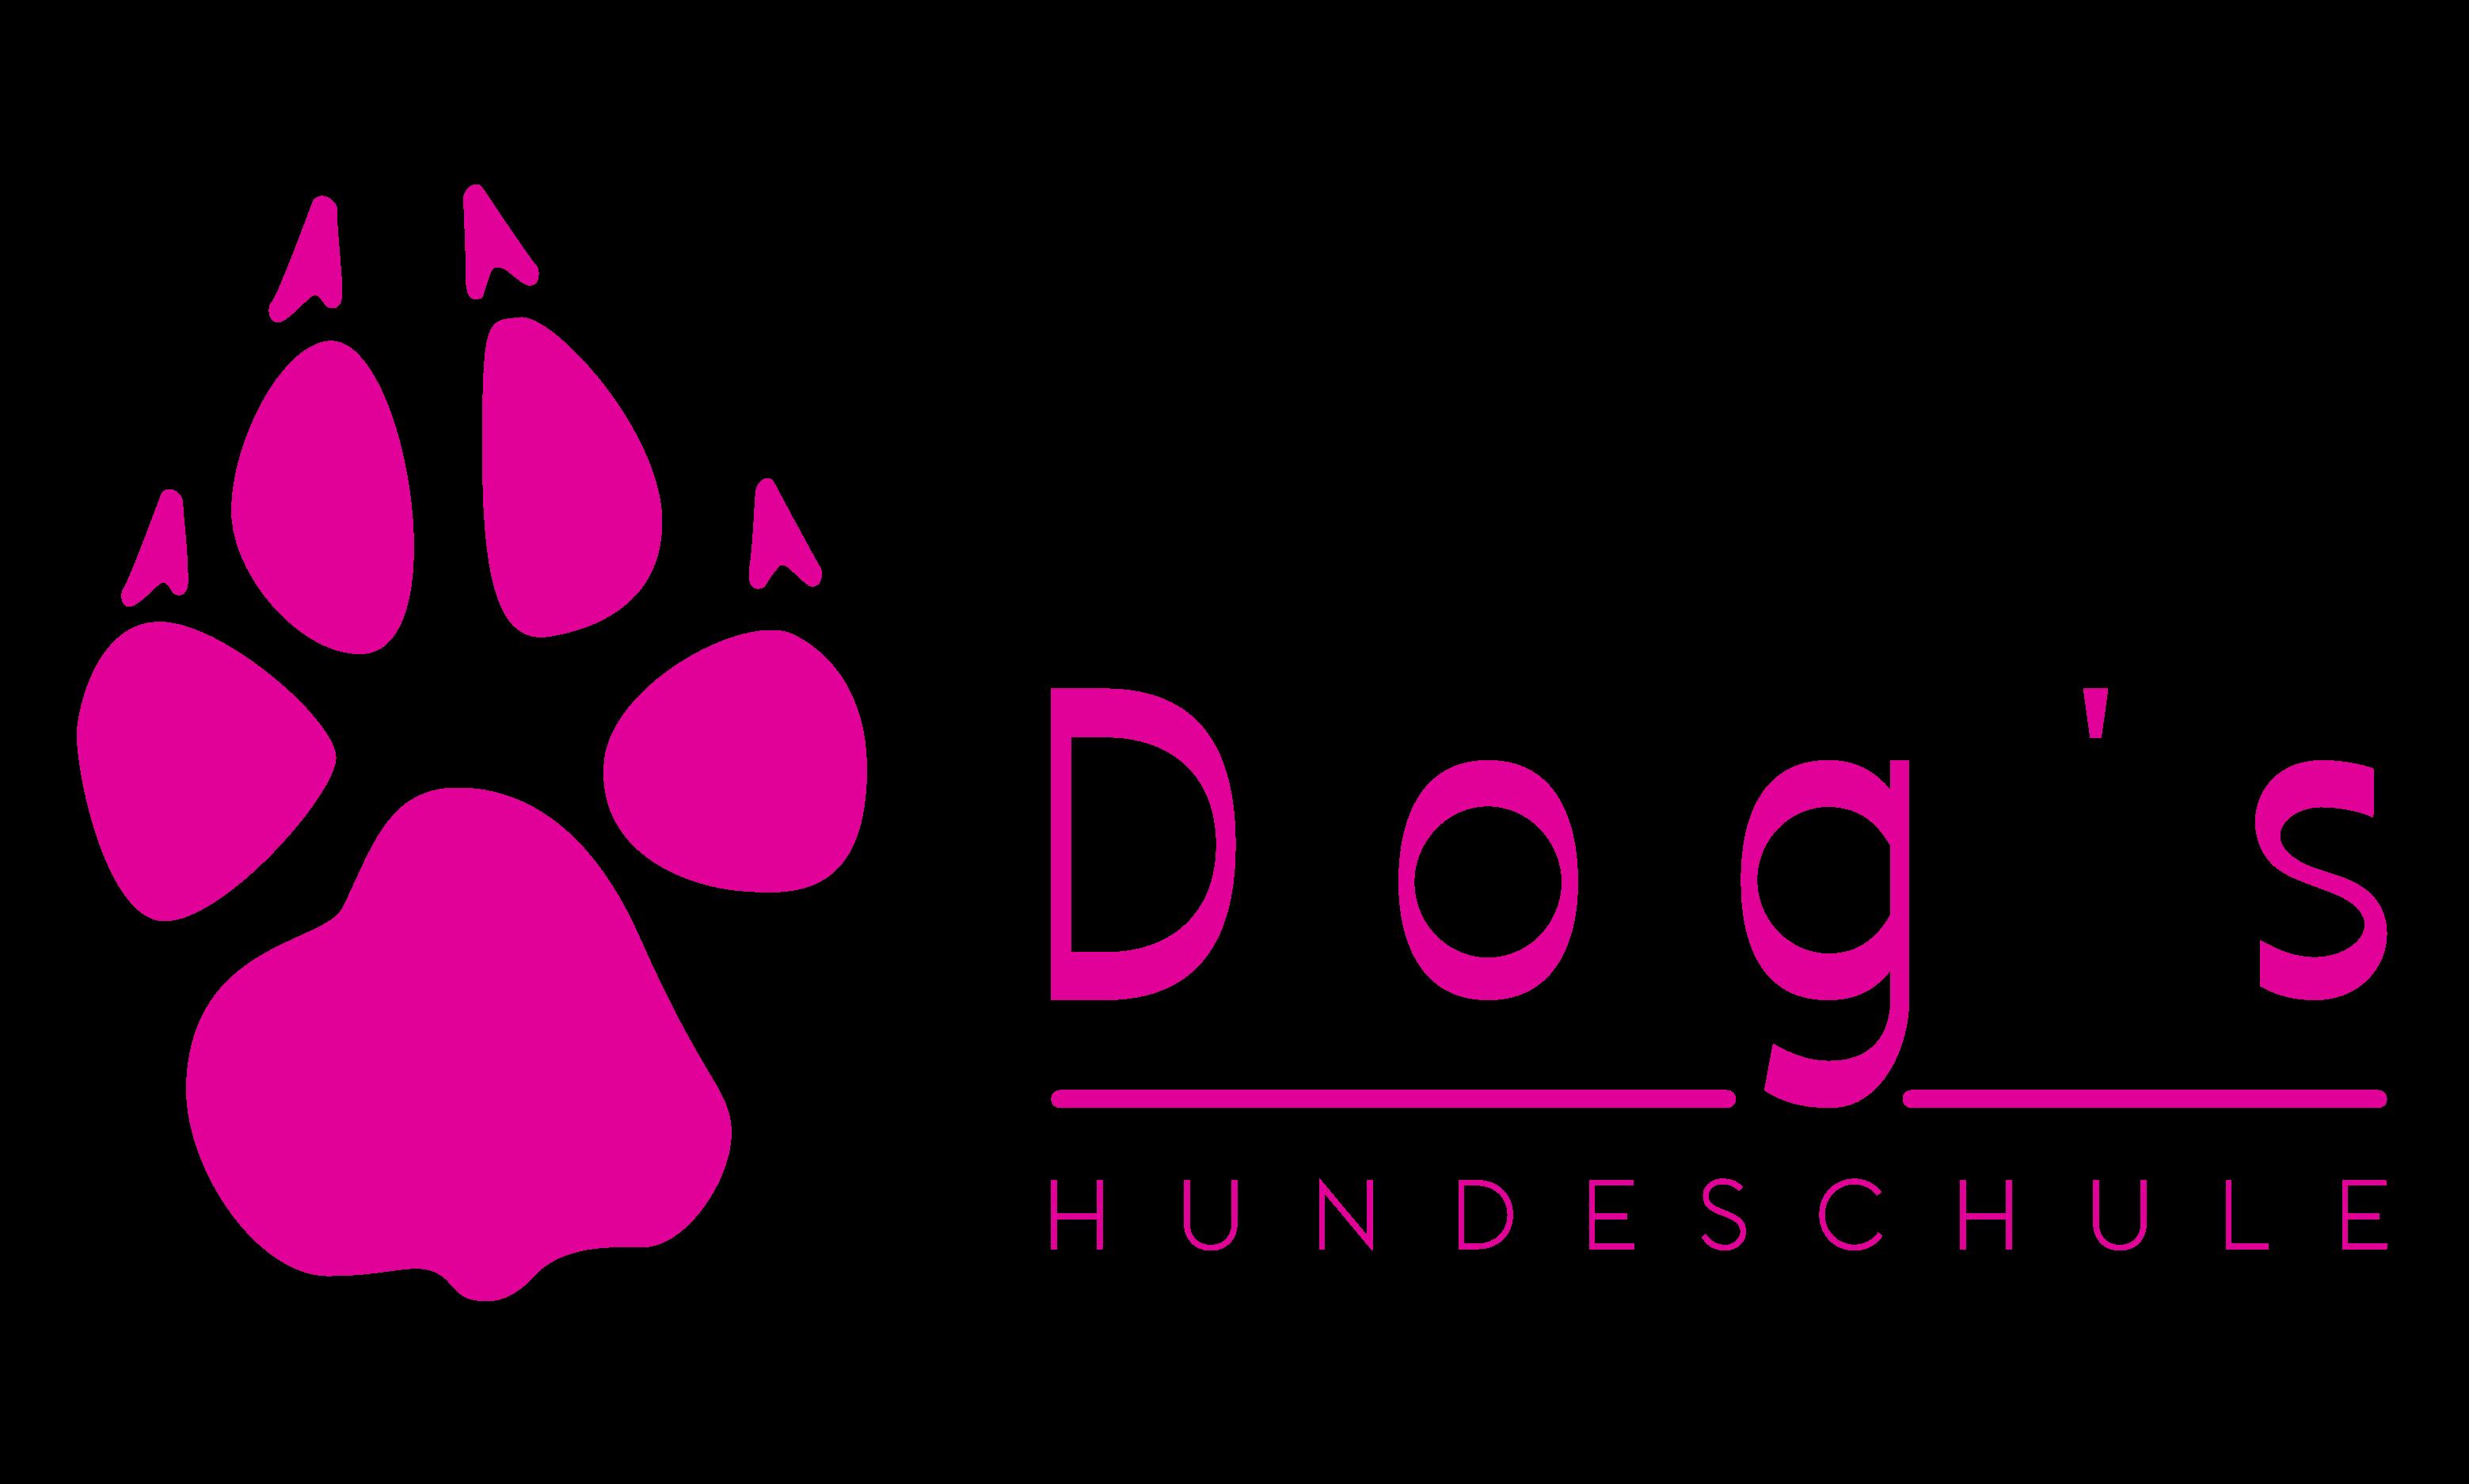 JuraDog's Hundeschule Logo